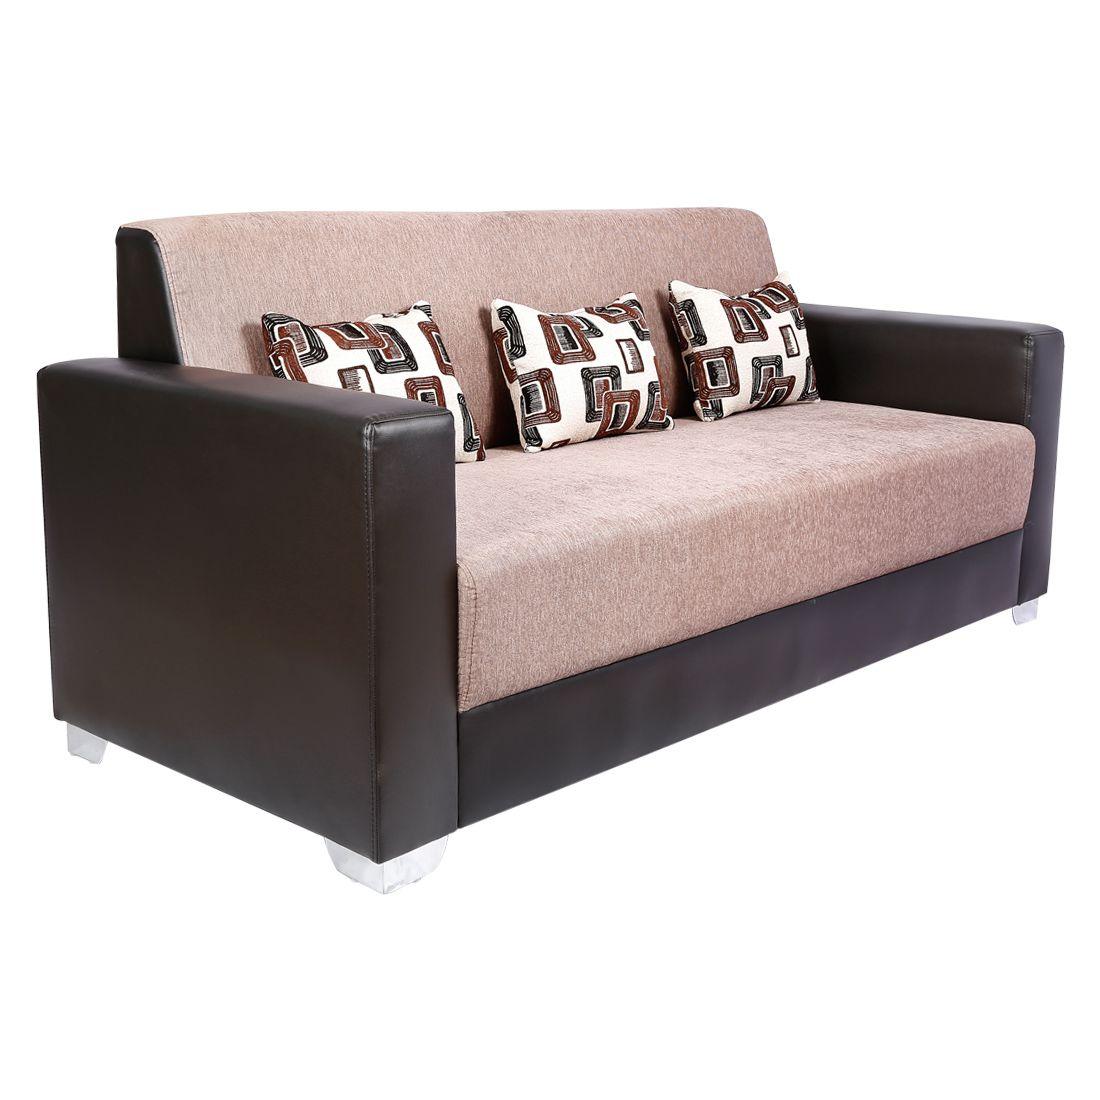 Wood Mark Straight Line 3+1+1 Sofa Set   Buy Wood Mark Straight Line 3+1+1  Sofa Set Online At Best Prices In India On Snapdeal